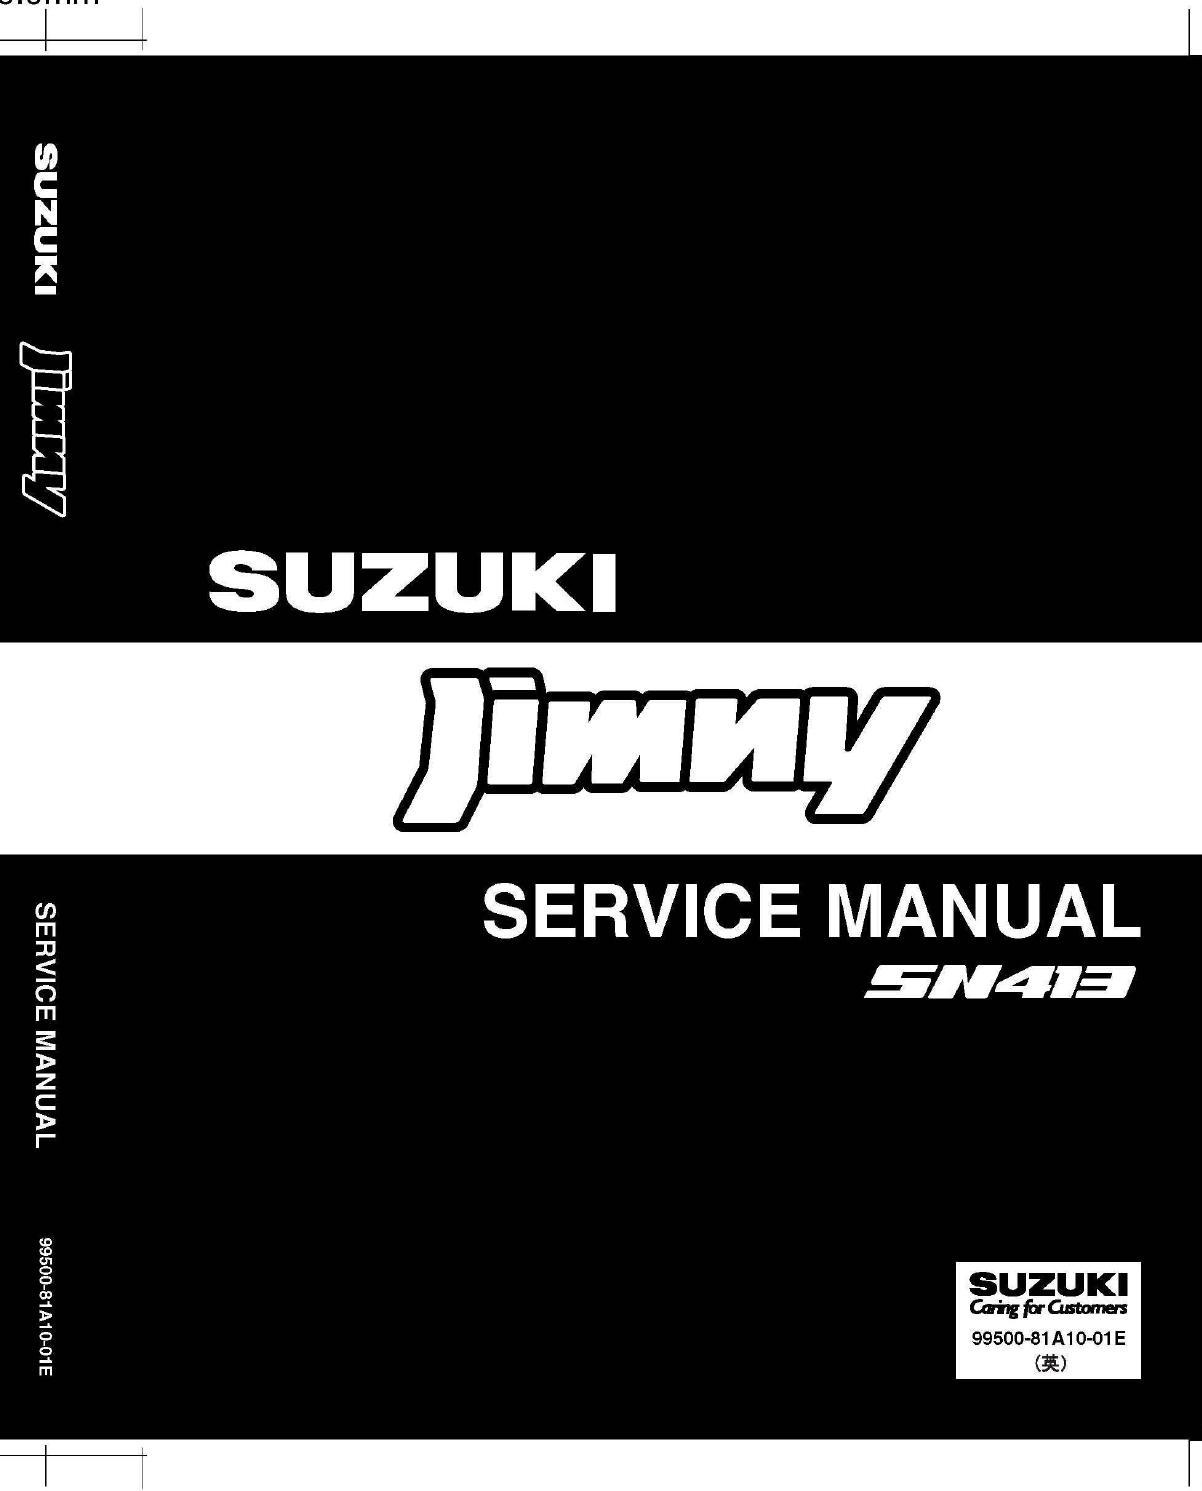 Arm Bushing For Rear Track Control Rod For Suzuki Jimny Sn413 1998-Now